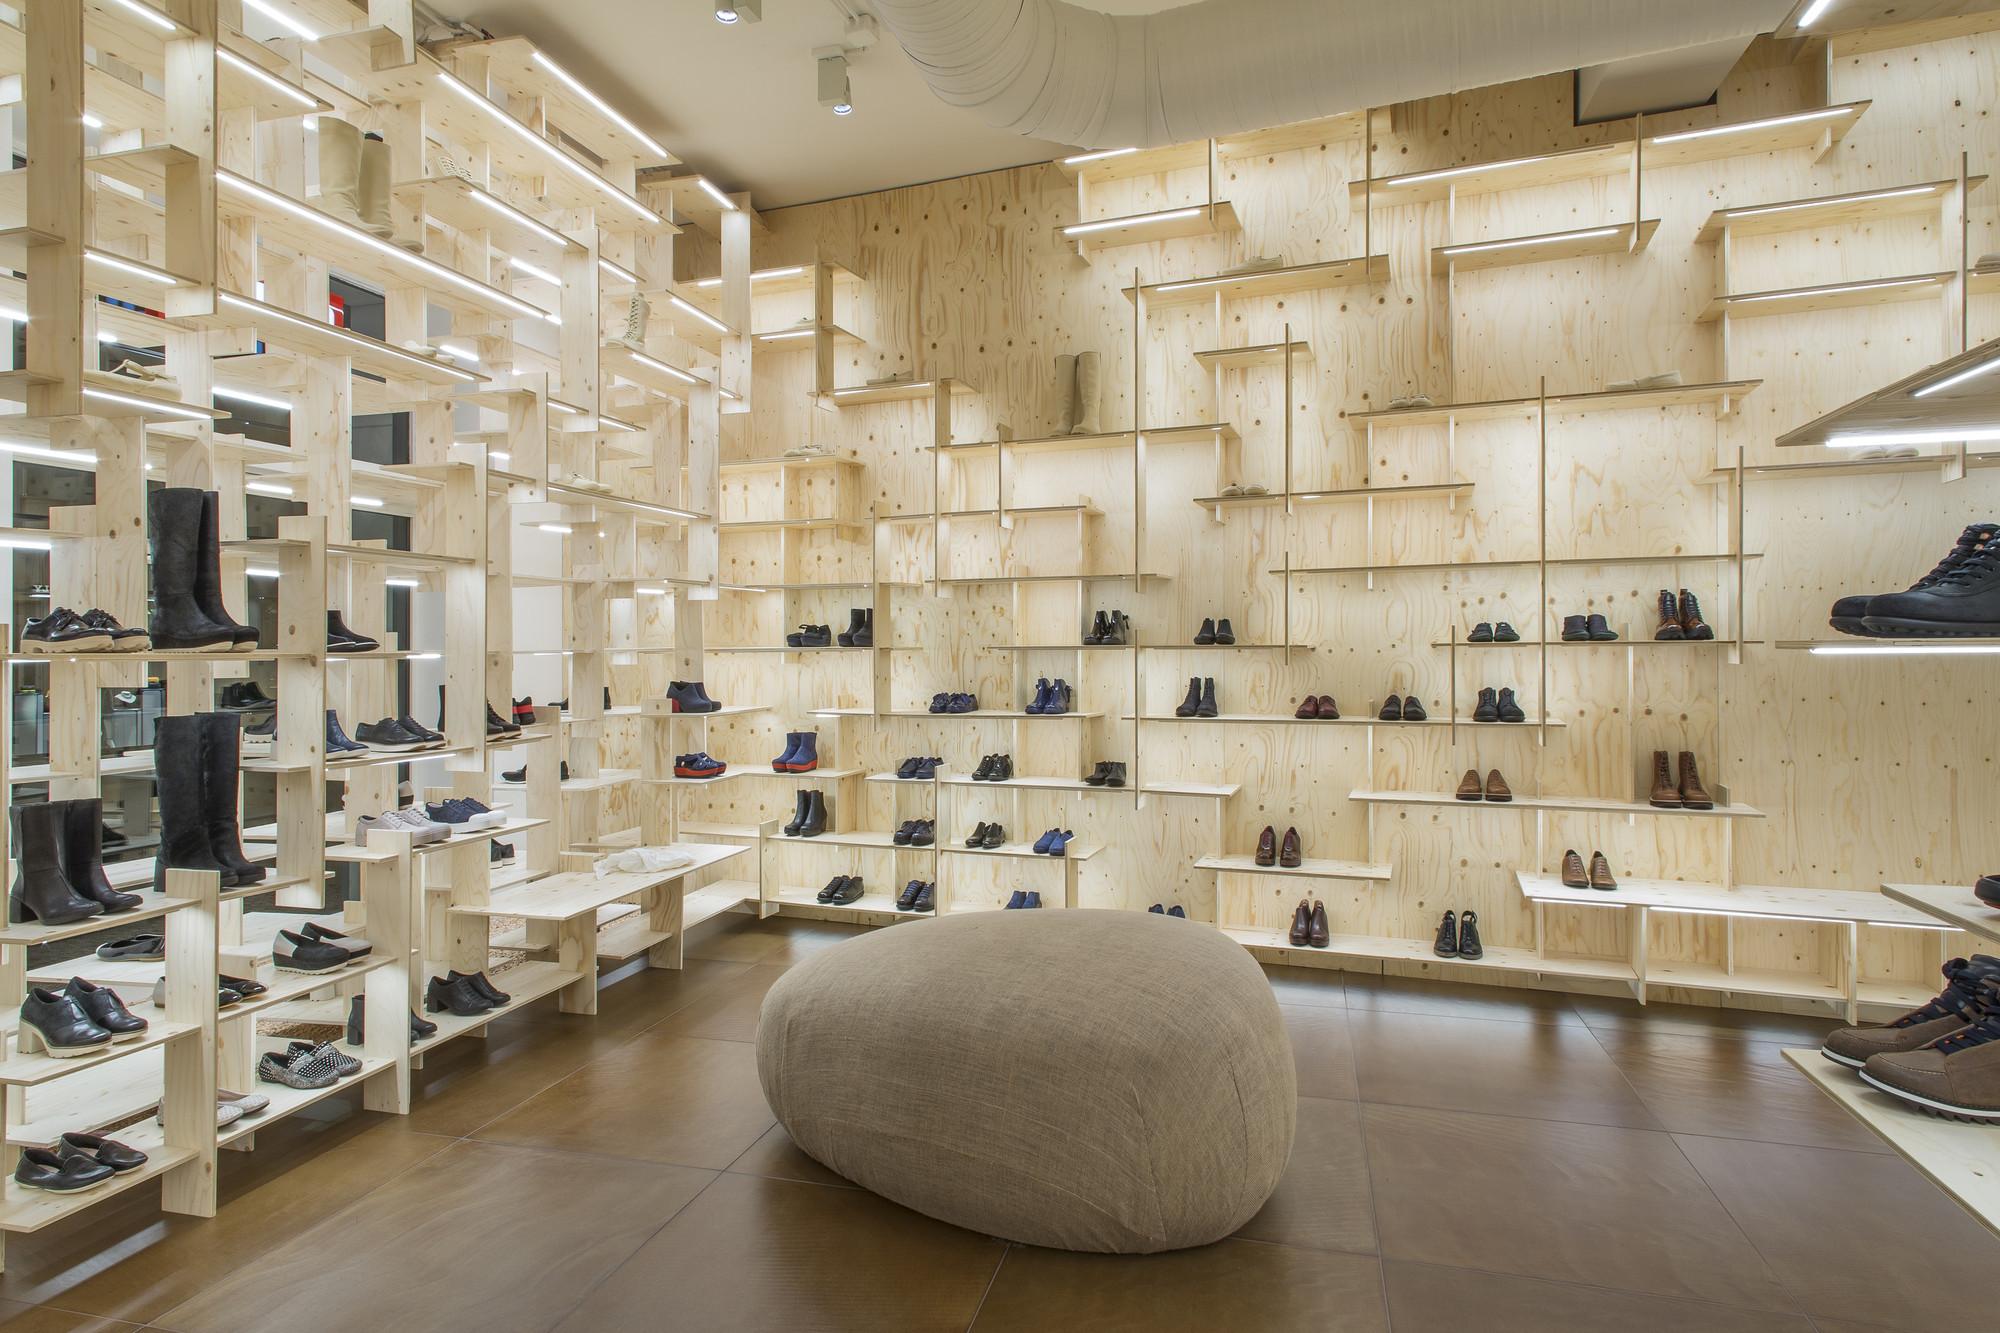 Camper store milano kengo kuma associates archdaily for Interior design agency milano